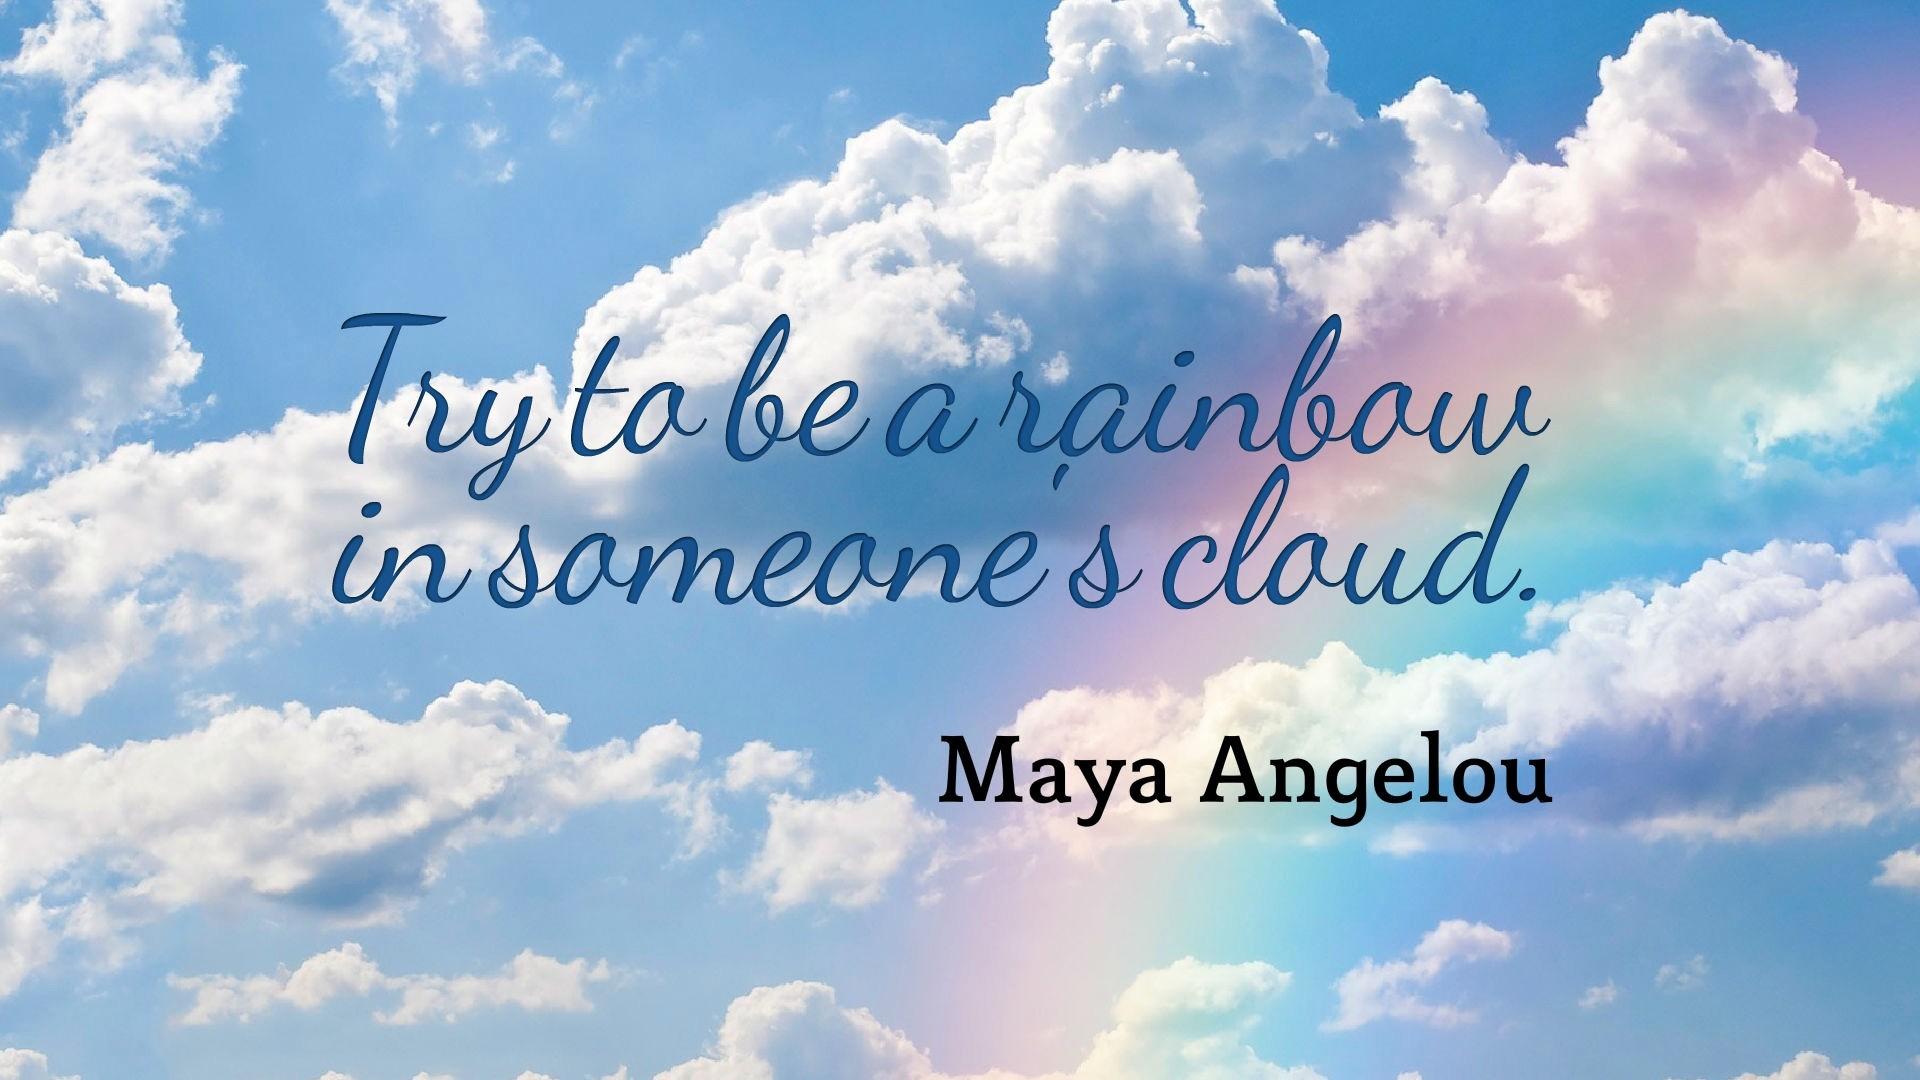 Inspirational Quotes Wallpaper: Girly Inspirational Desktop Wallpaper (61+ Images